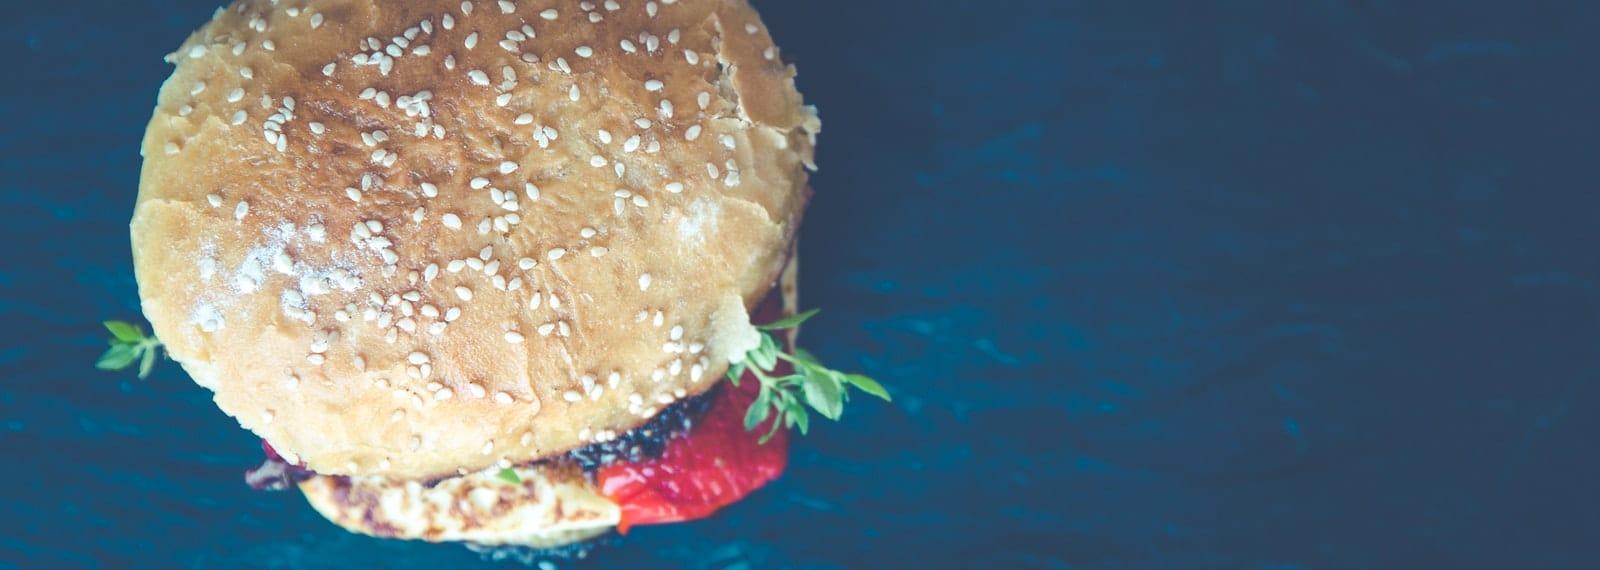 Gesunder Burger